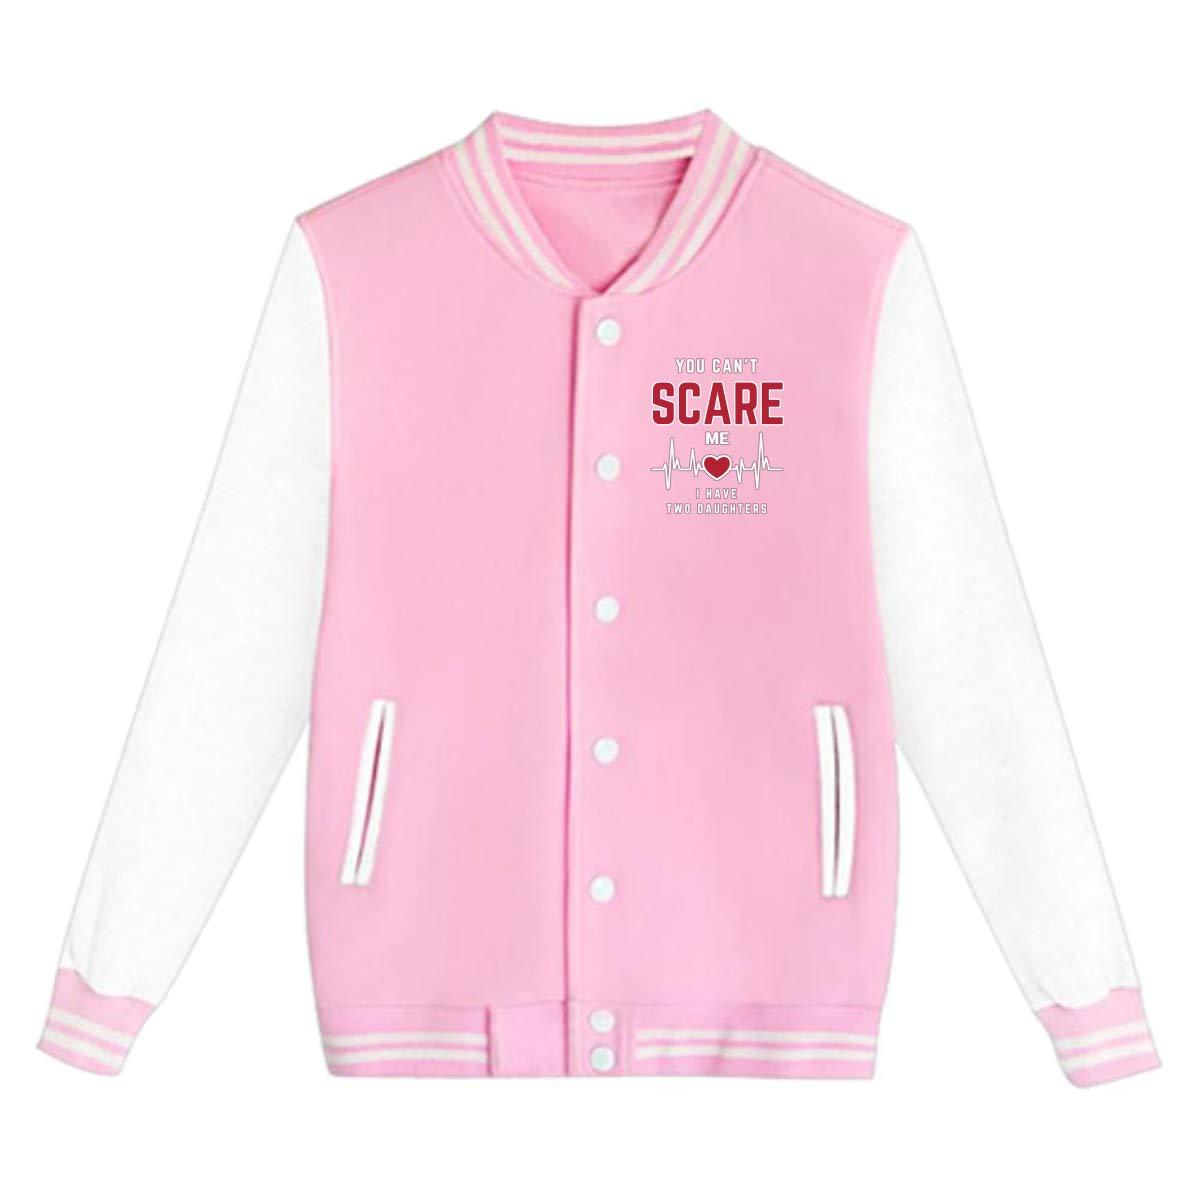 Tina TN You Cant Scare Me I Have Two Daughters Teens Boys Girl Varsity Baseball Jacket Long Sleeve Sport Baseball Uniform Jacket Coat Sweater Black